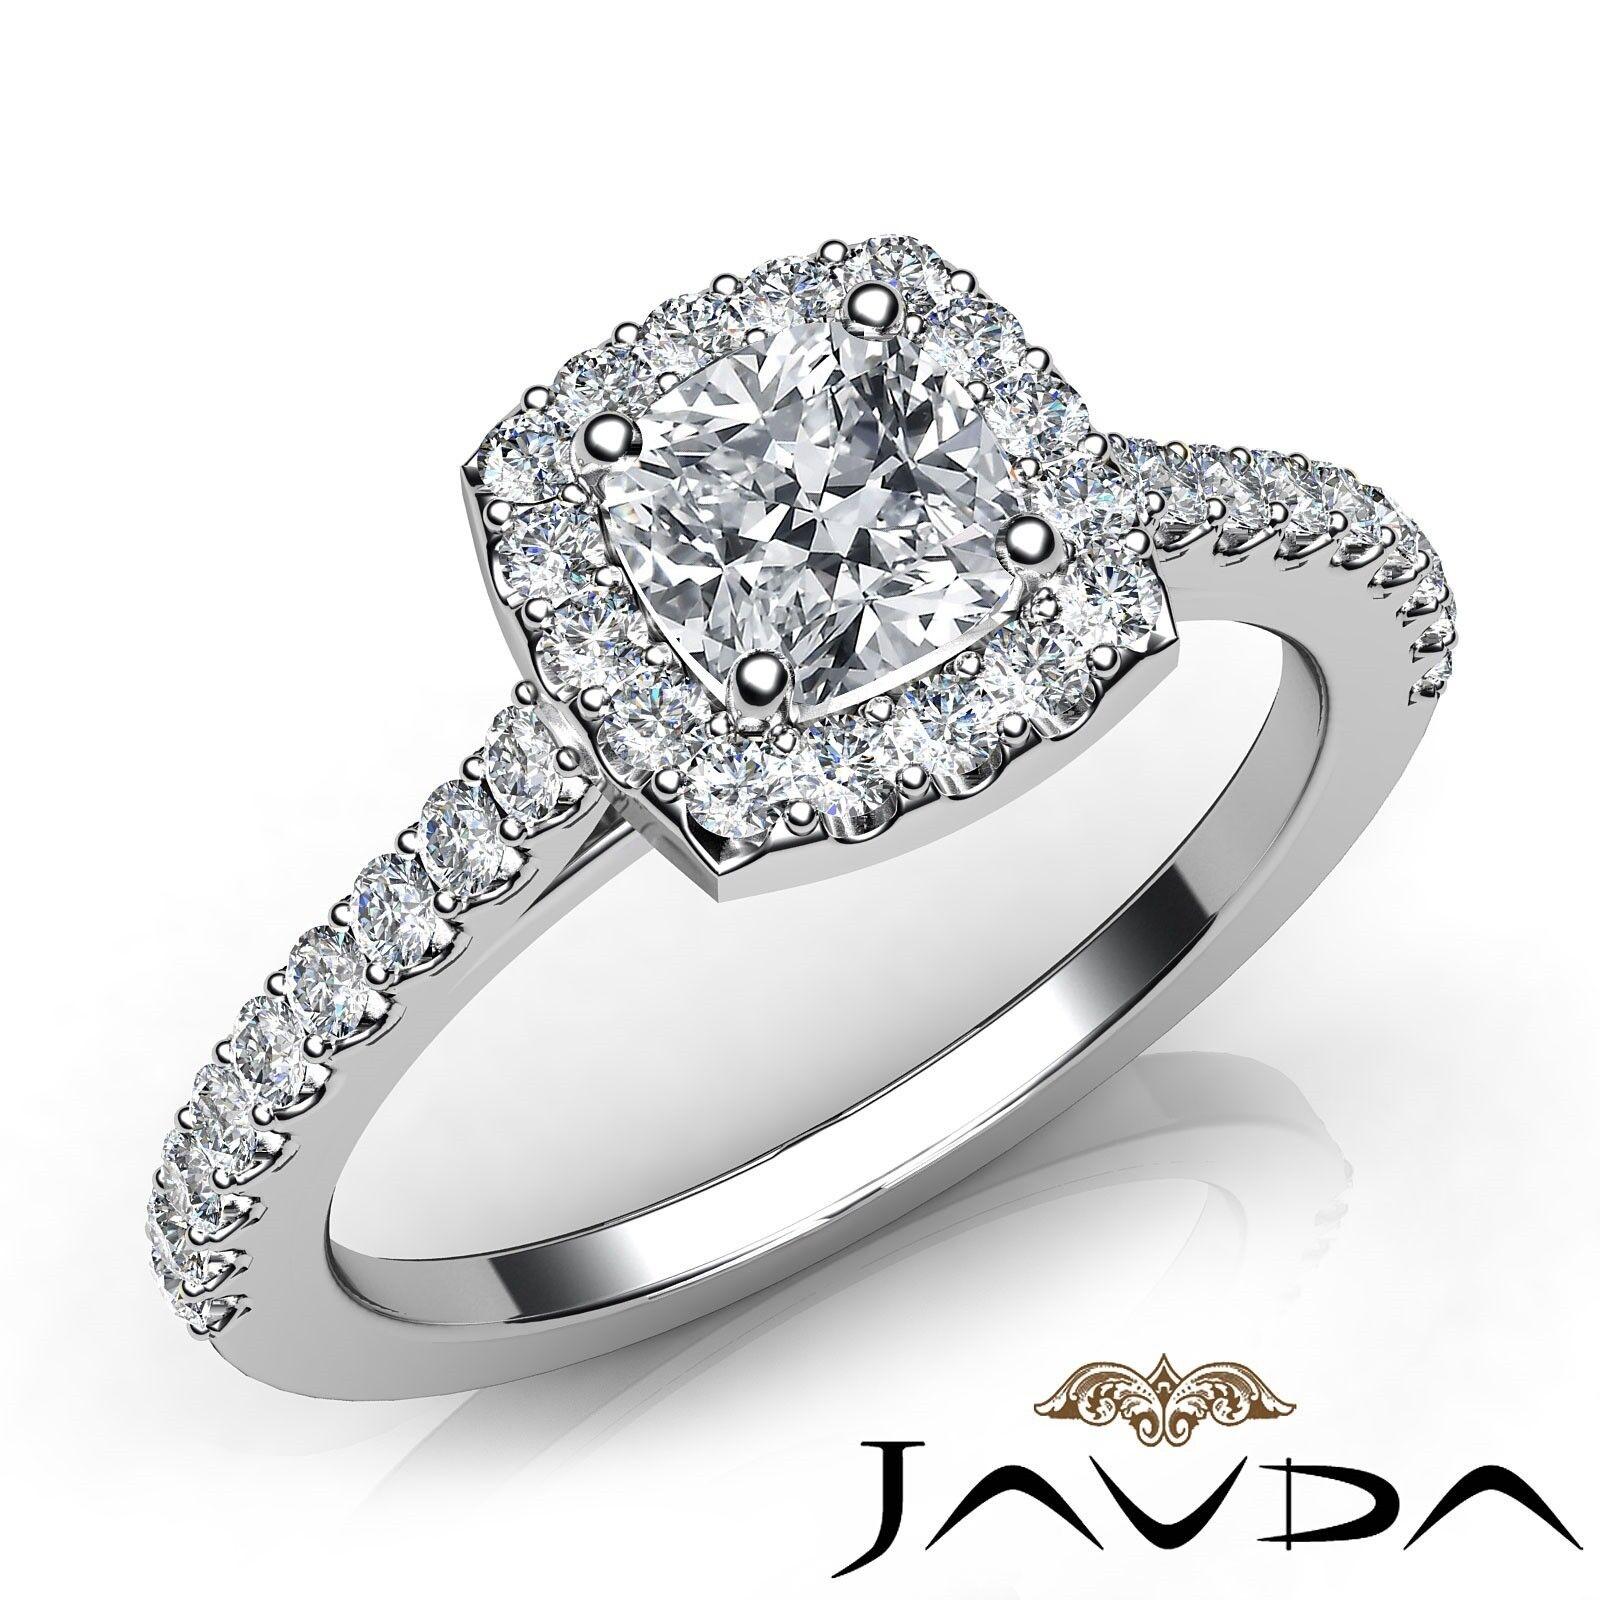 1.05ctw U Cut Pave Set Halo Cushion Diamond Engagement Ring GIA F-VS2 White Gold